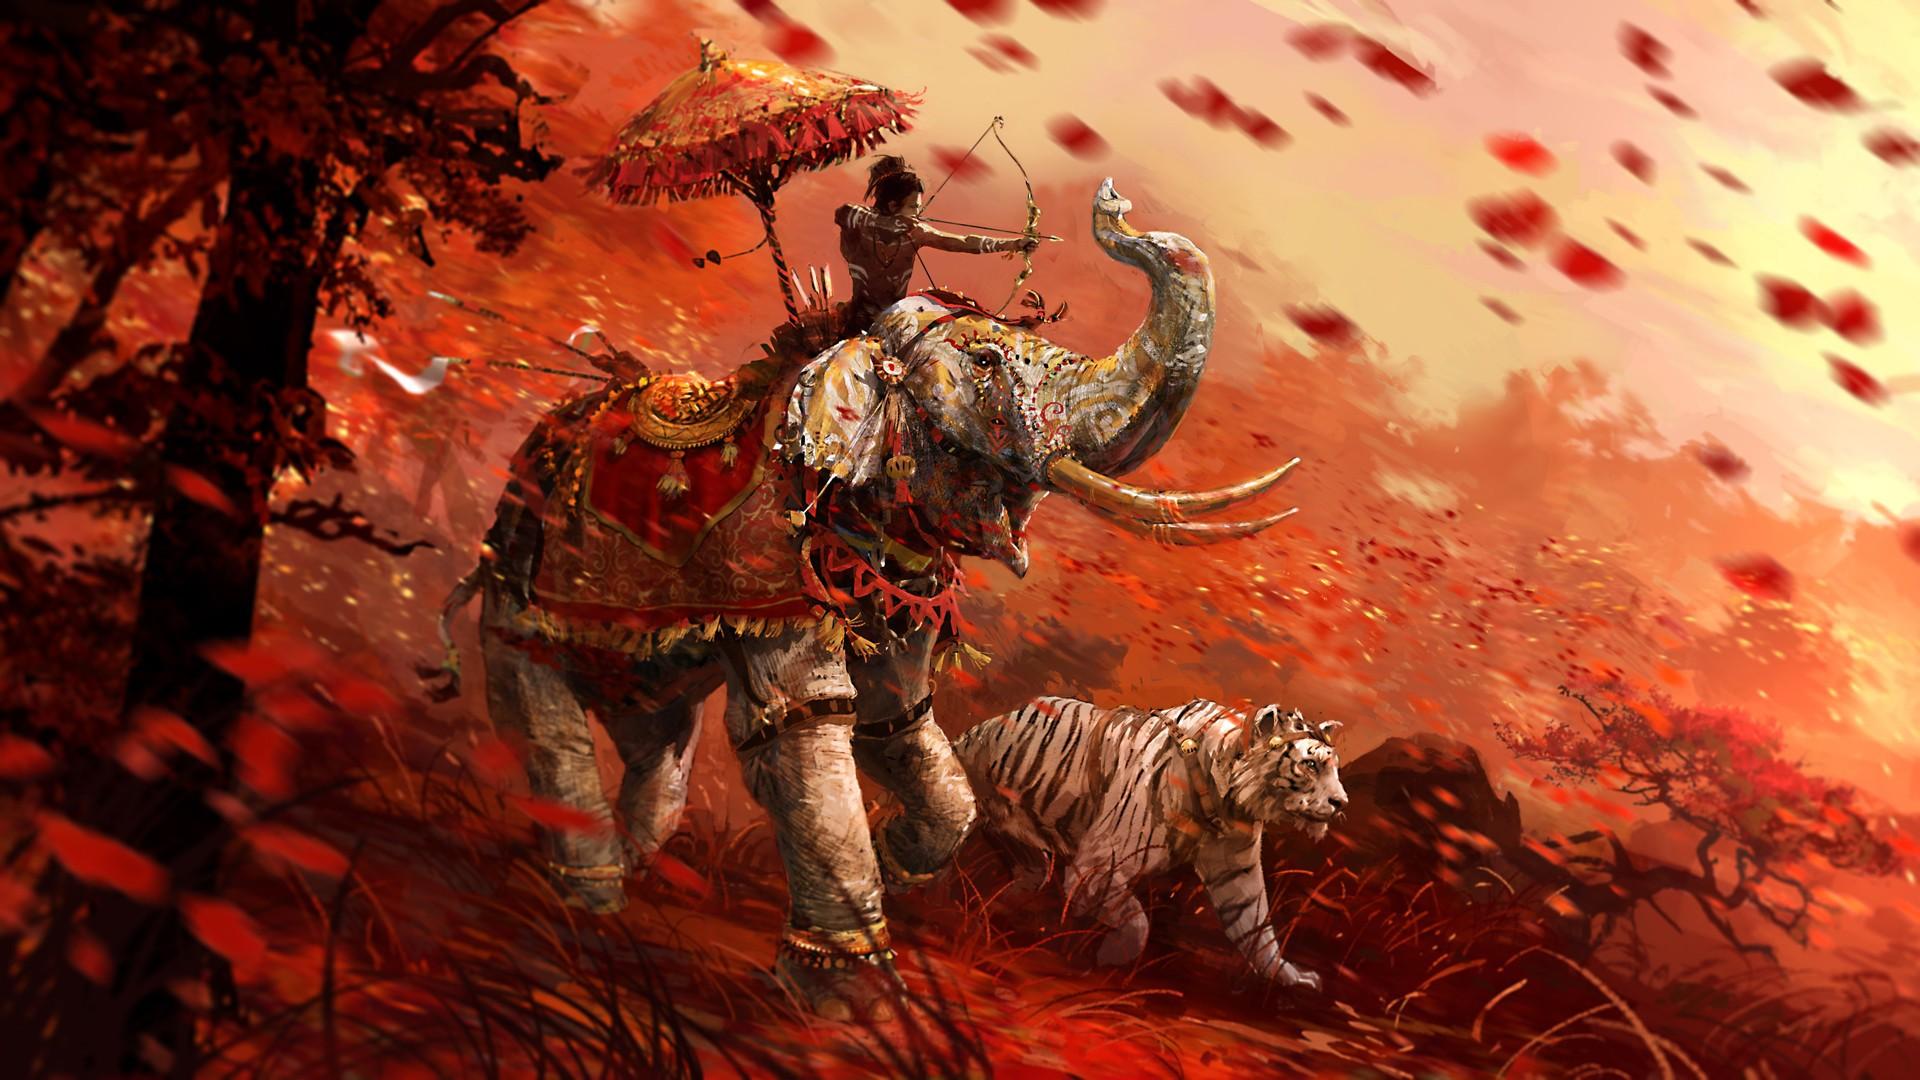 Indian Wallpaper (45 Wallpapers) – Adorable Wallpapers